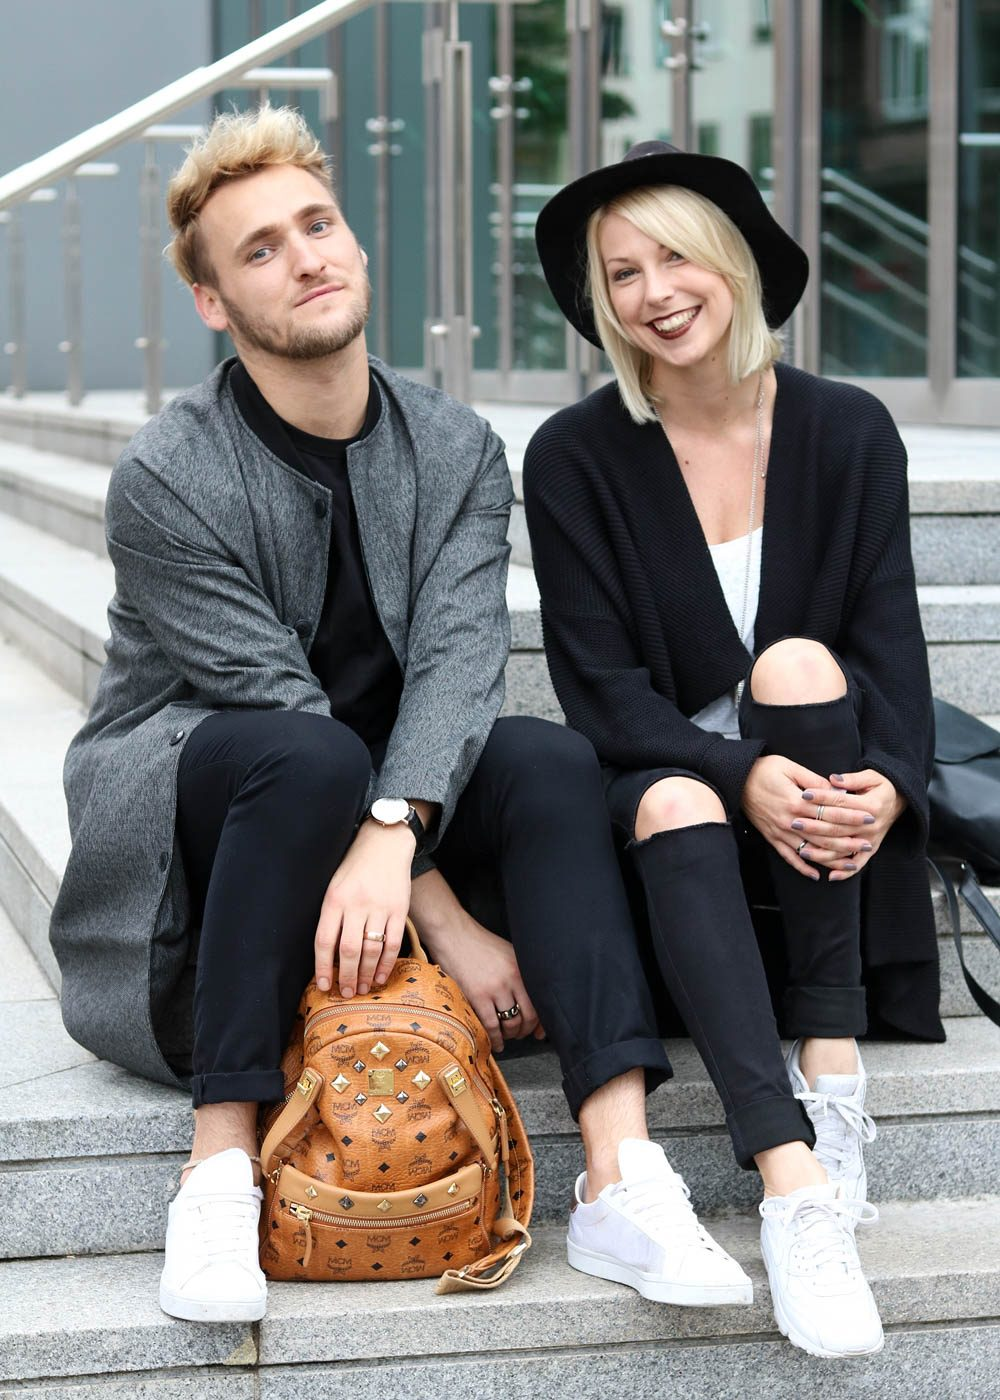 fashionblogger-mannheim-outfit-longcardigan-nike-air-max-skinnyjeans-rucksack-20-von-20